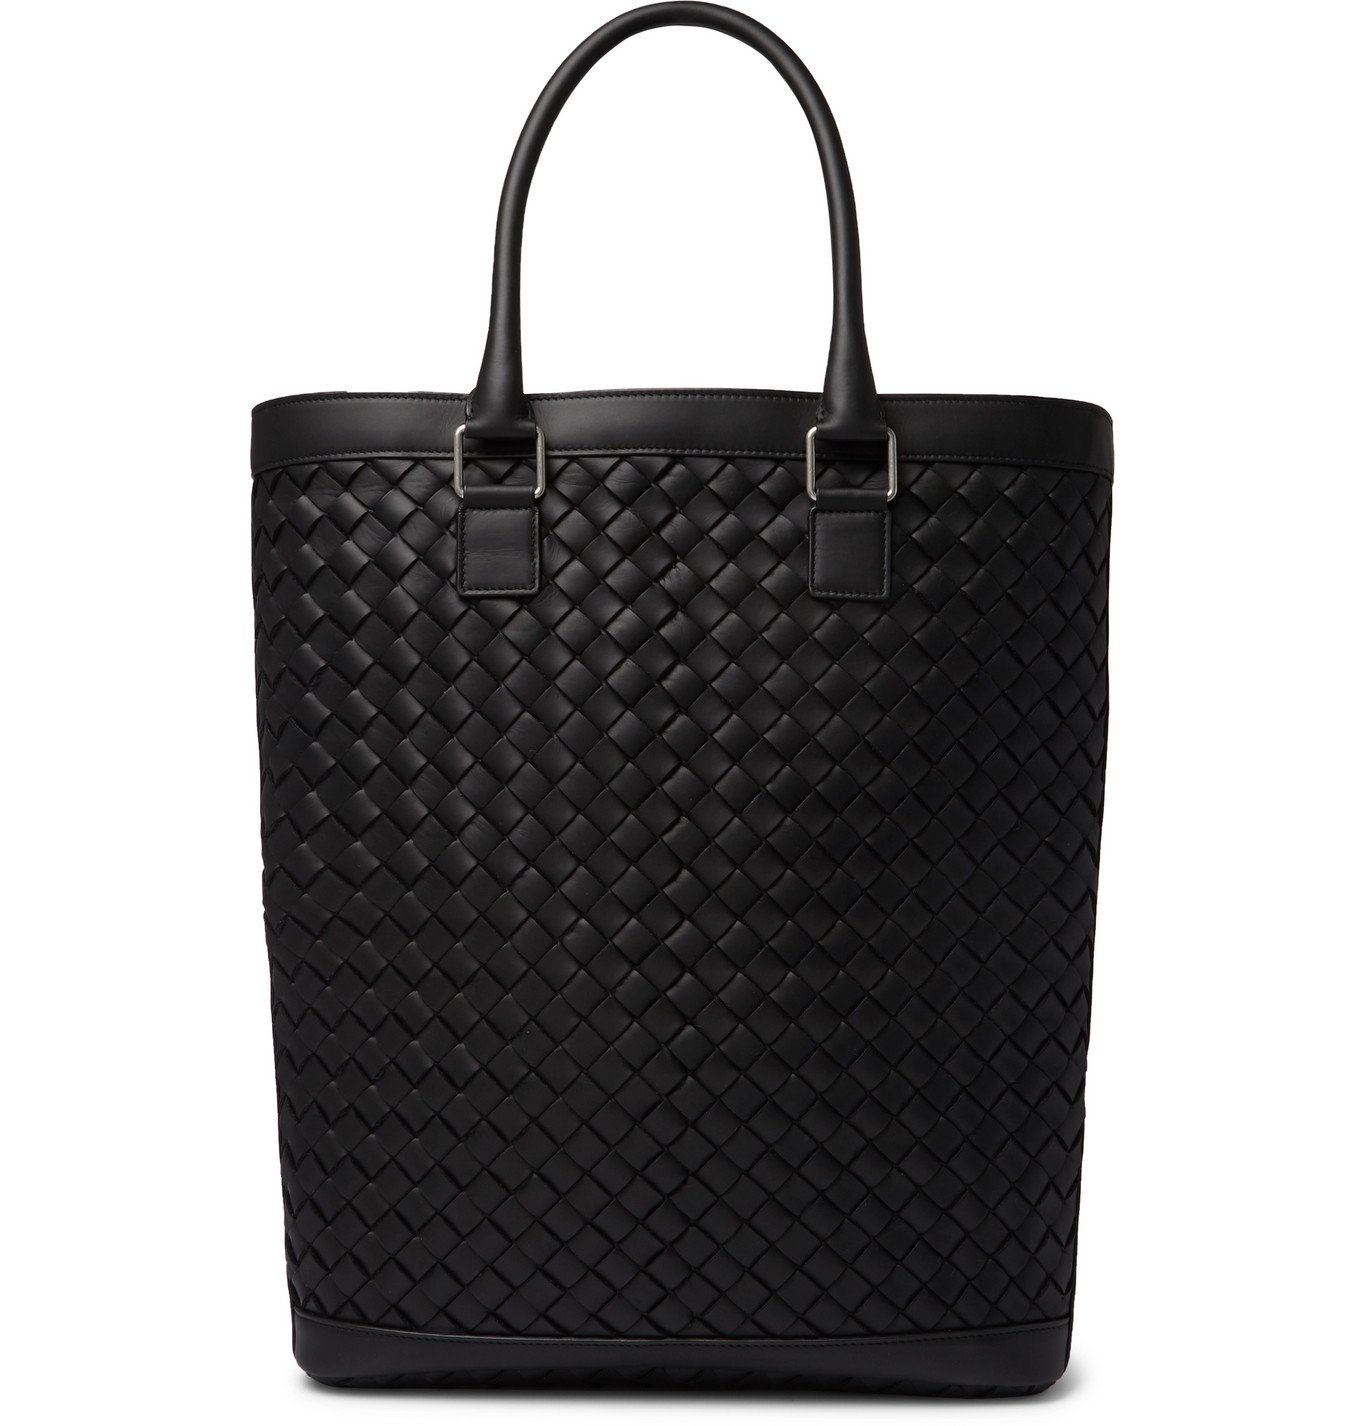 Photo: Bottega Veneta - Intrecciato Leather Tote Bag - Black